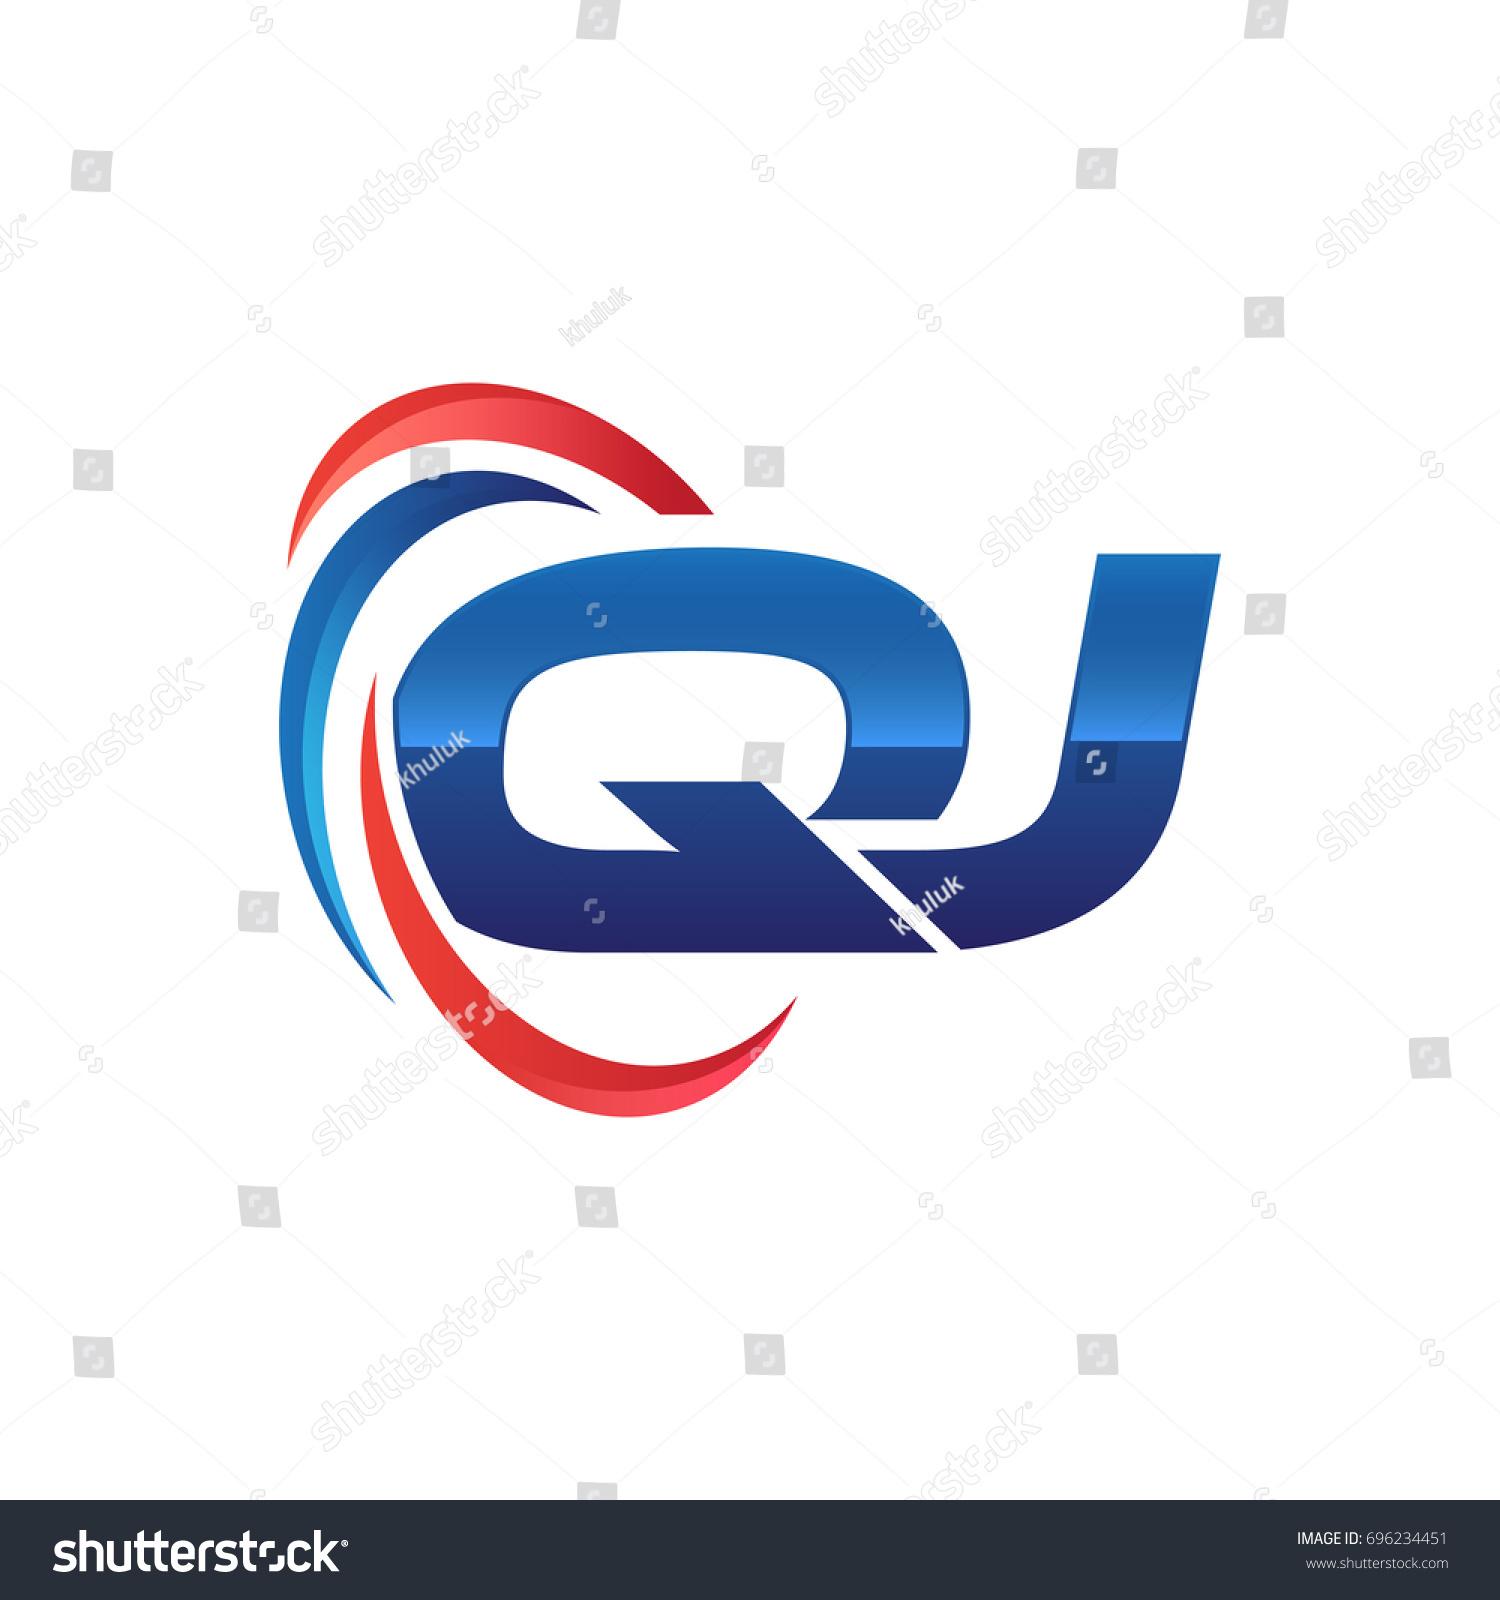 initial letter logo swoosh red blue stock vector 696234451 rh shutterstock com swoosh login family member swoosh logo meaning